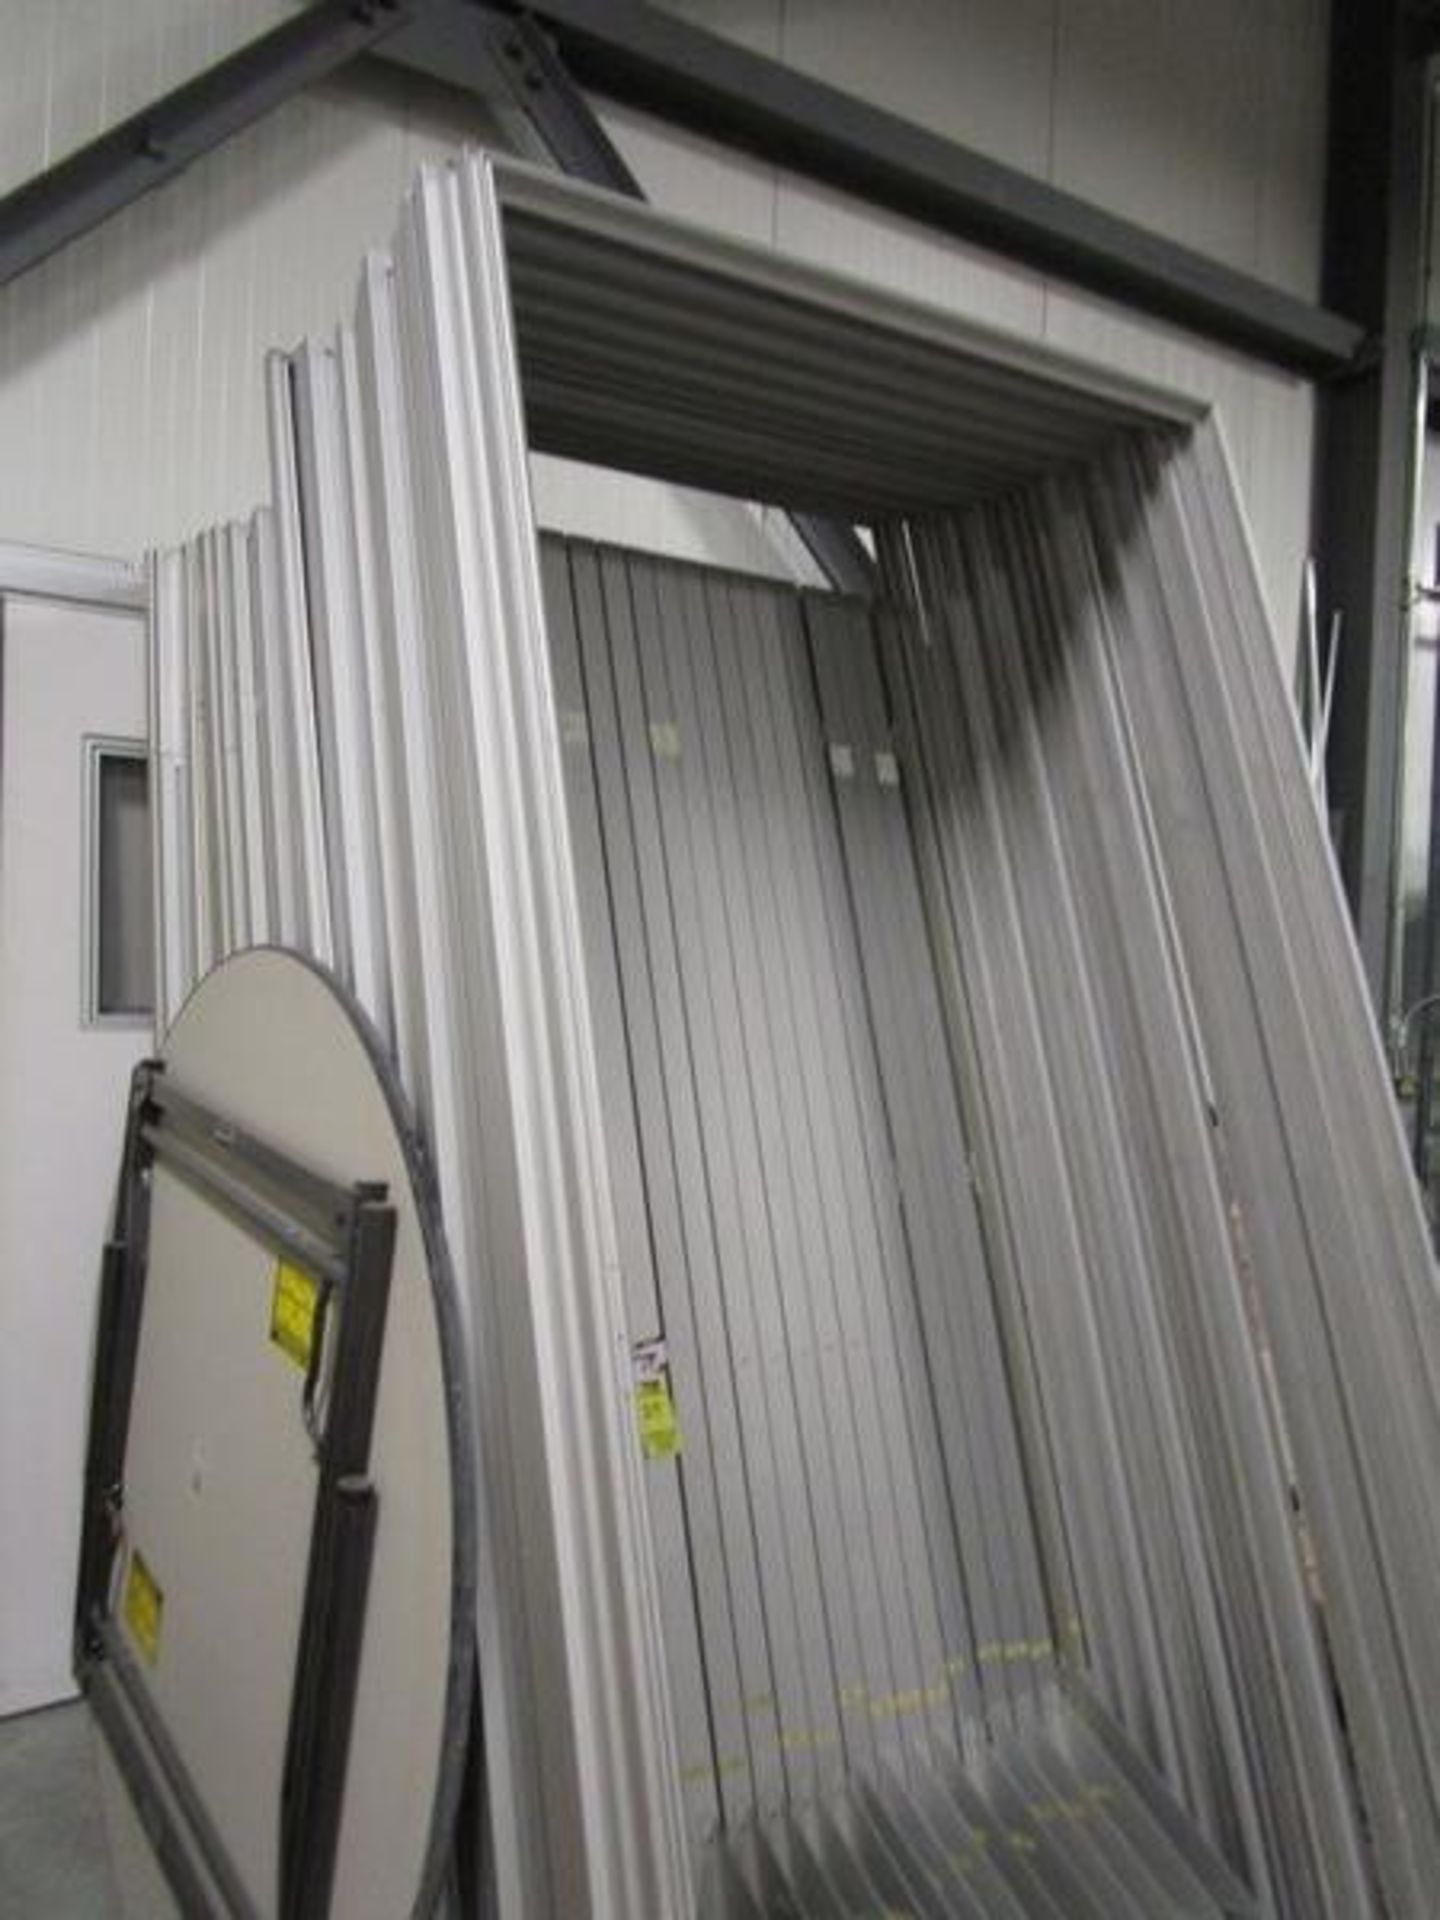 Terra Universal 16'W x 44'L x 8'H Custom Cleanroom, Hardwall, Acrylic, External Mount Pads, Class - Image 2 of 8